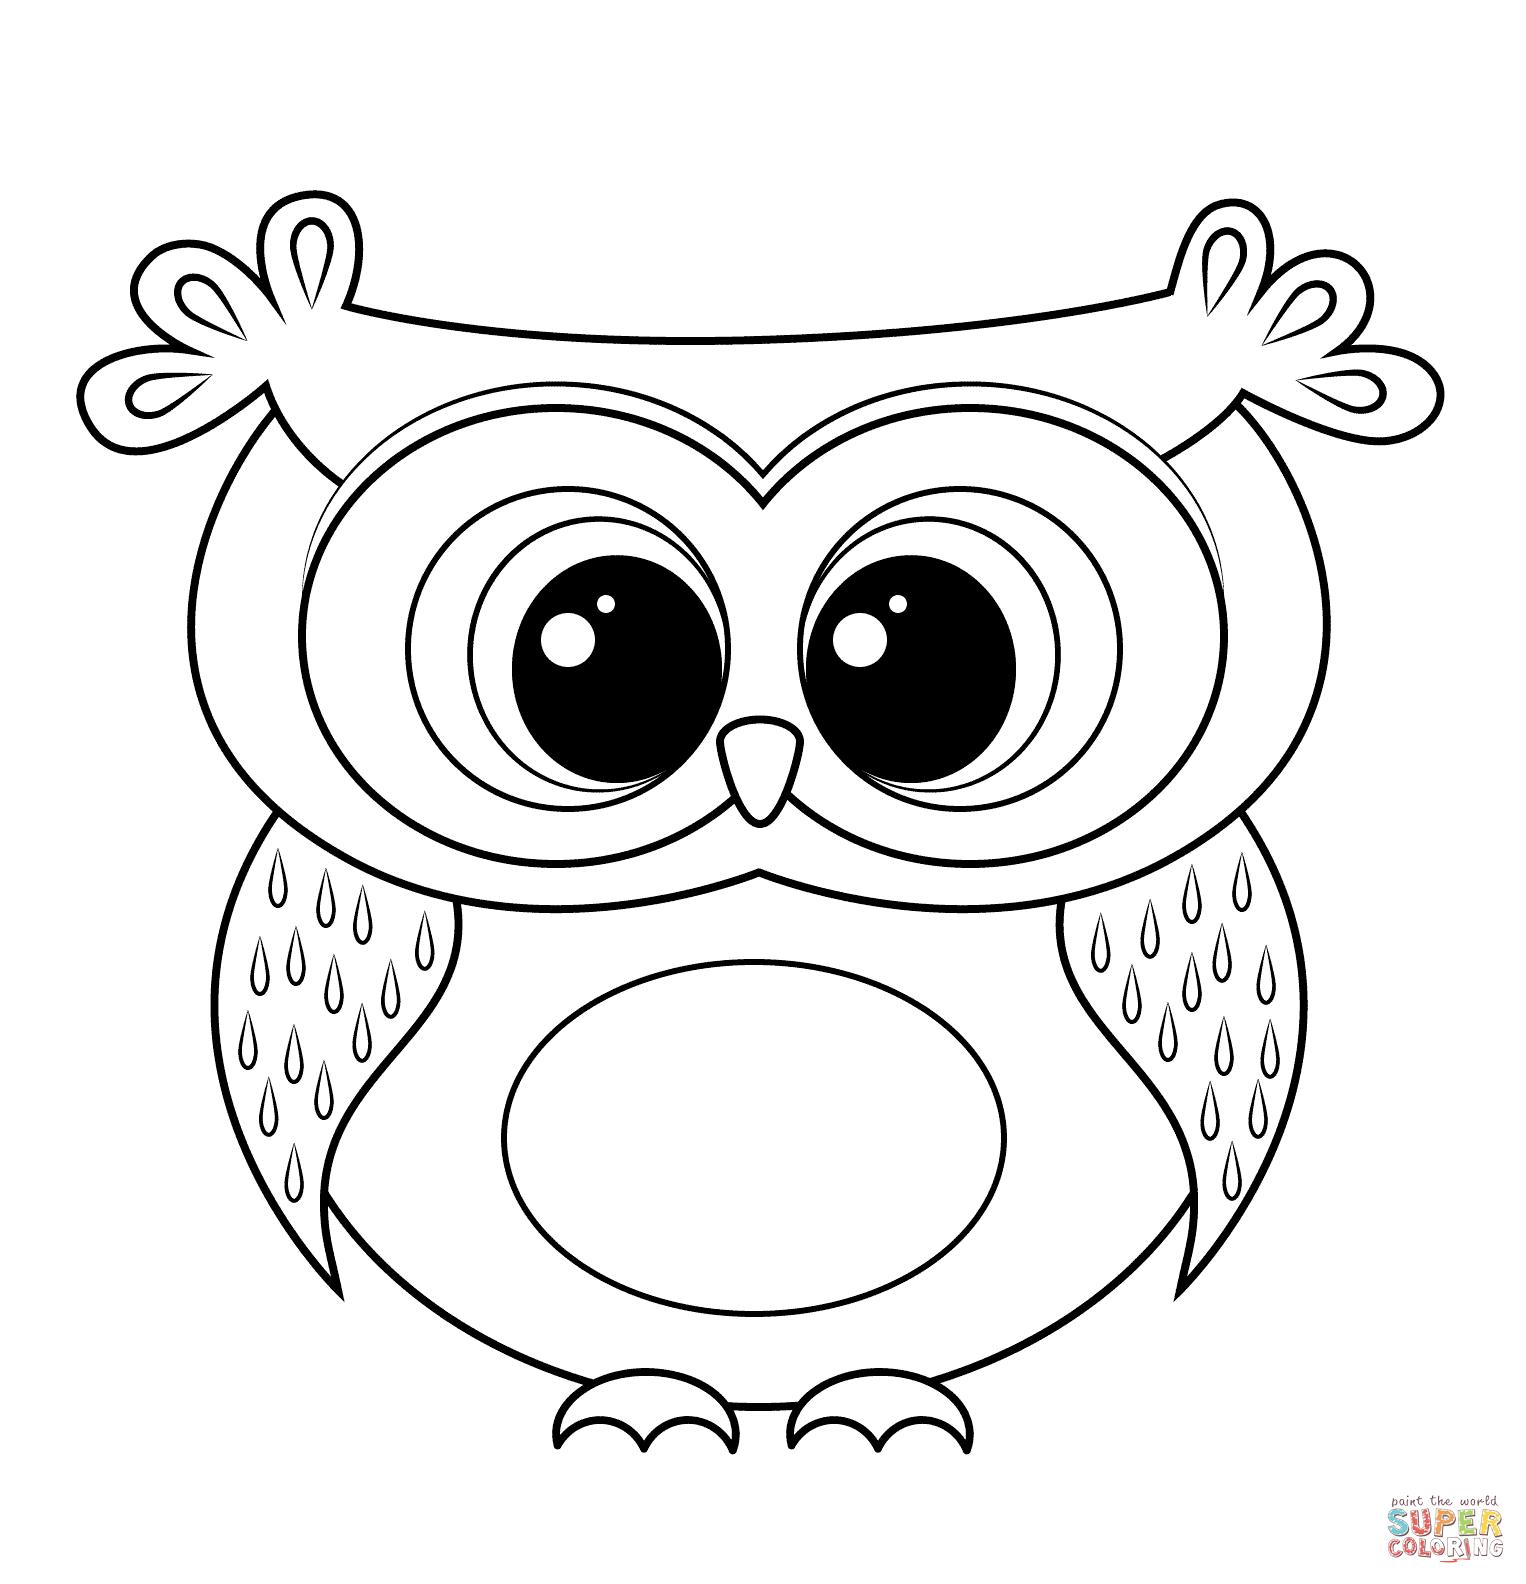 Cartoon Owl Coloring Page | Free Printable Coloring Pages - Free Printable Owl Coloring Sheets